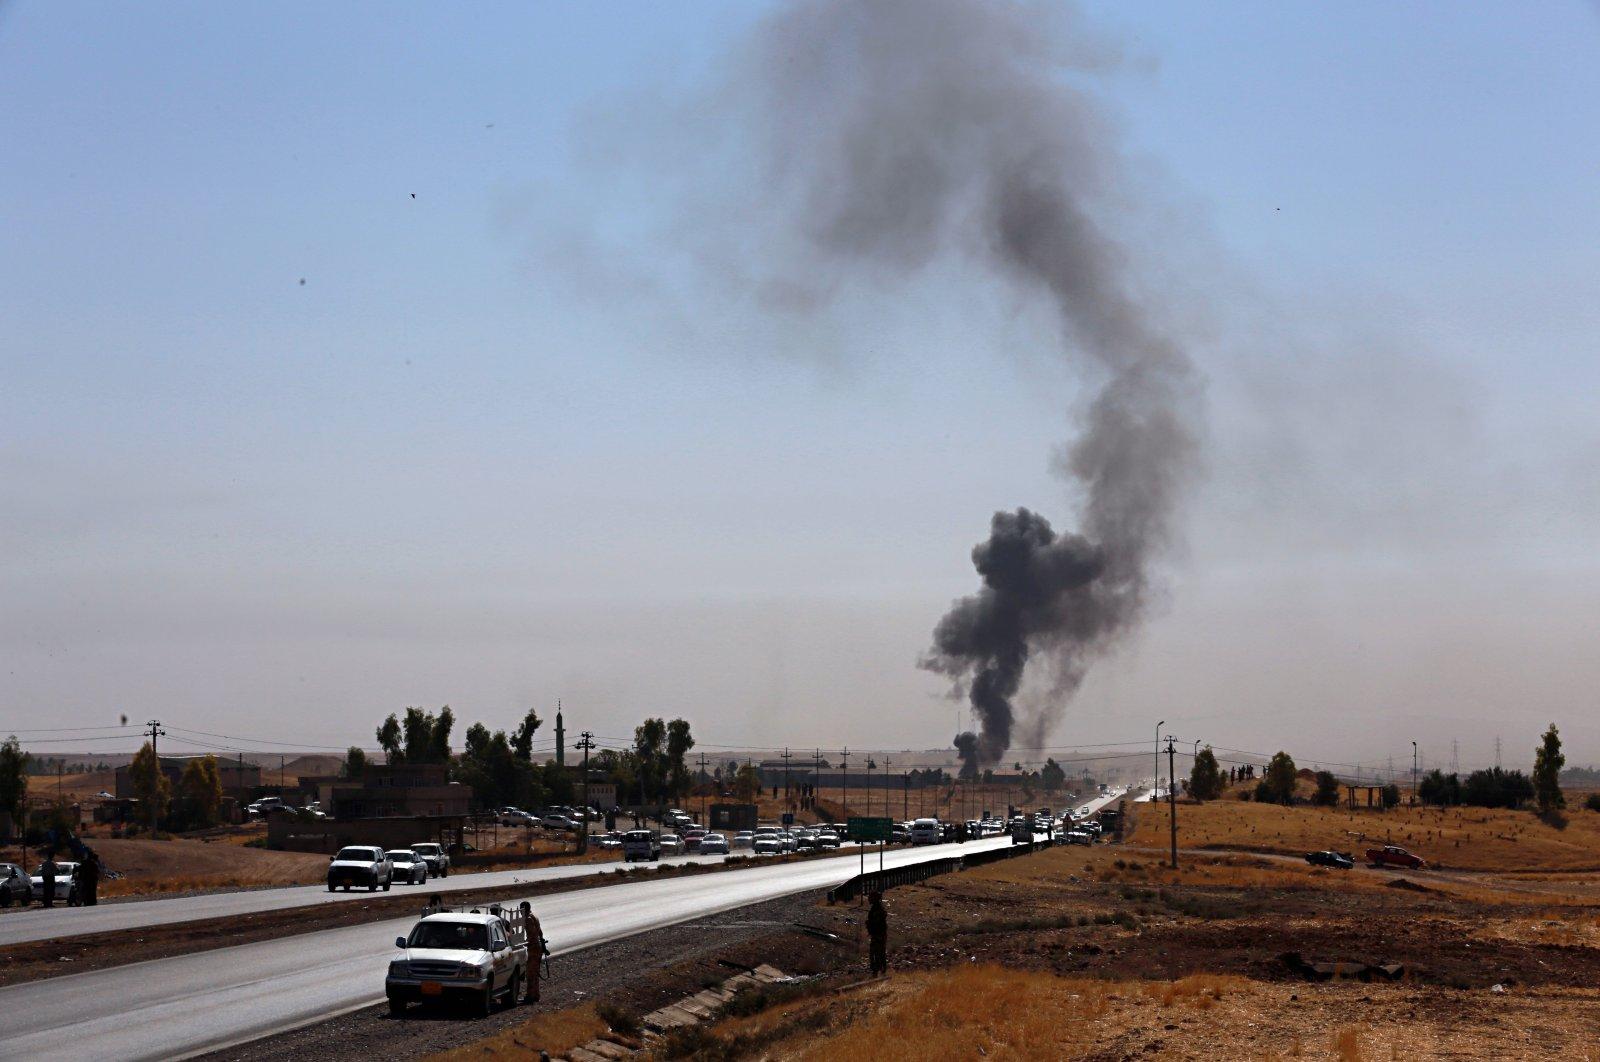 Smoke rises while in Alton Kupri, outskirts of Irbil, Iraq, Oct. 20, 2017. (AP Photo)